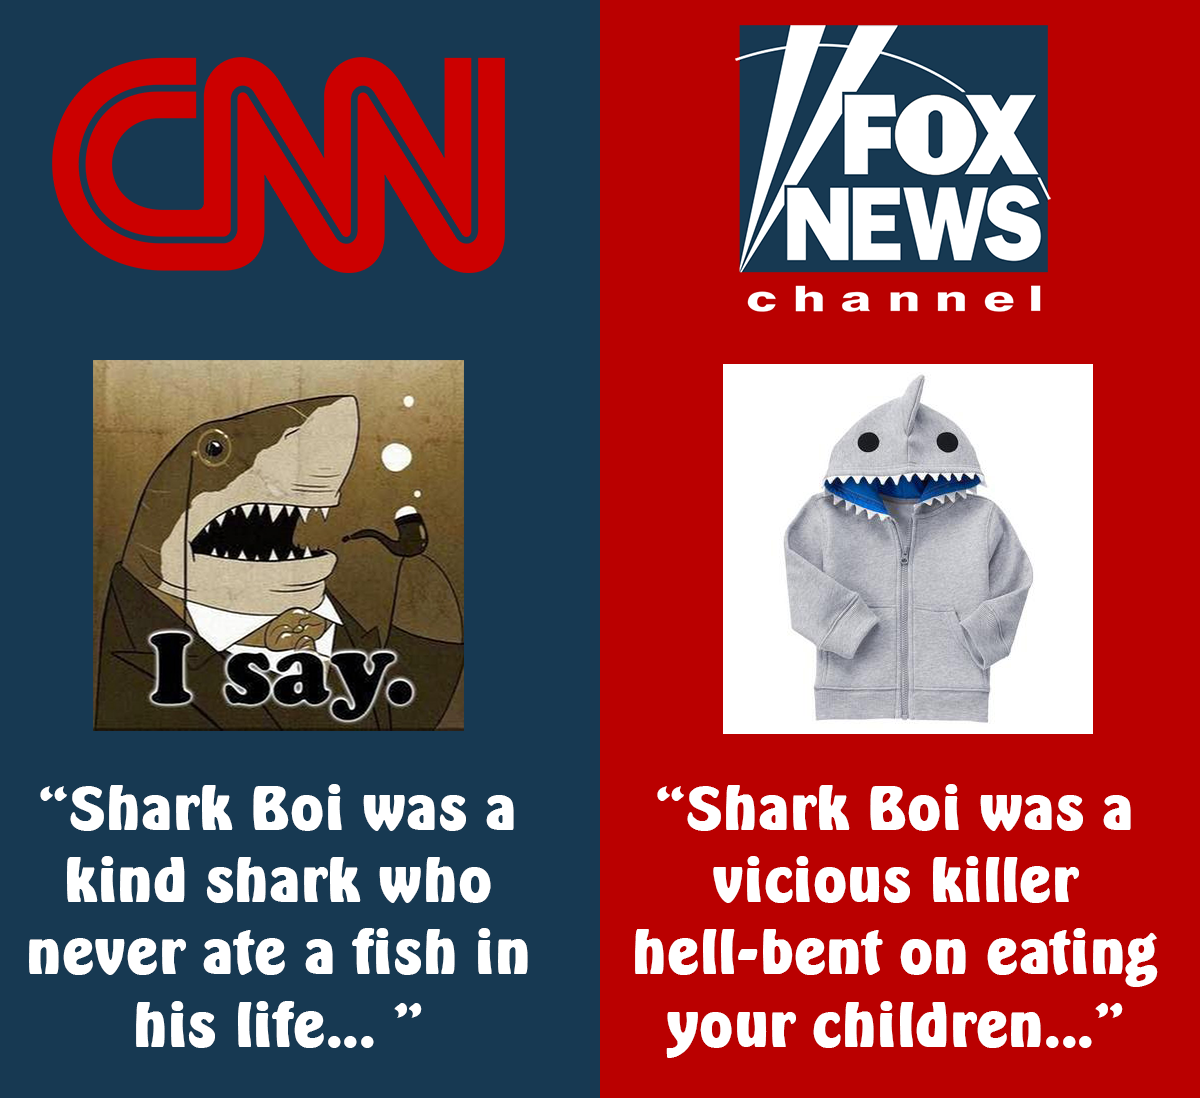 cnn-fox-news